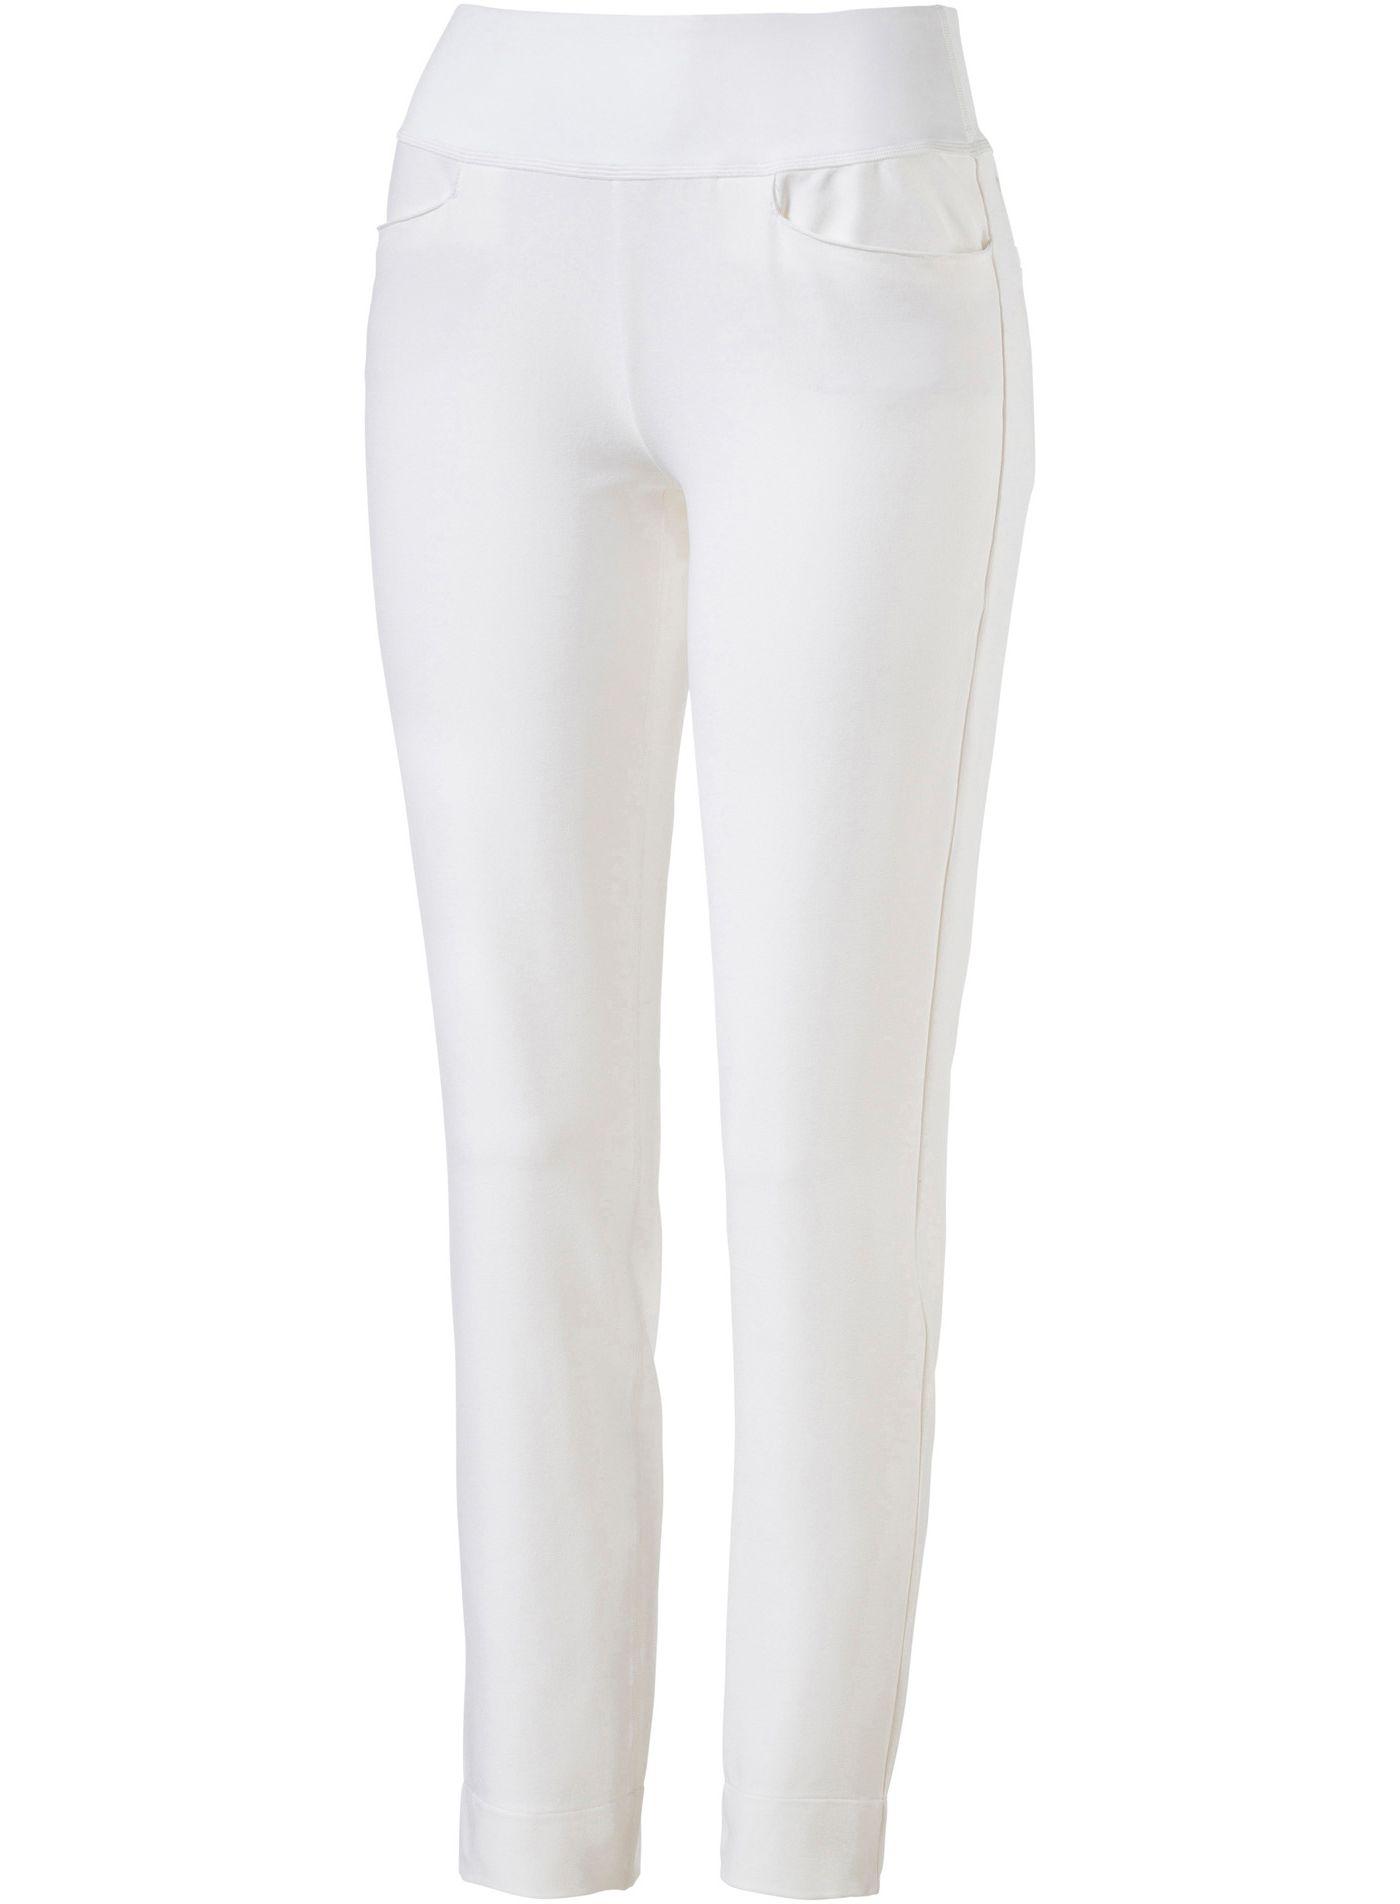 PUMA Women's PWRSHAPE Golf Pants